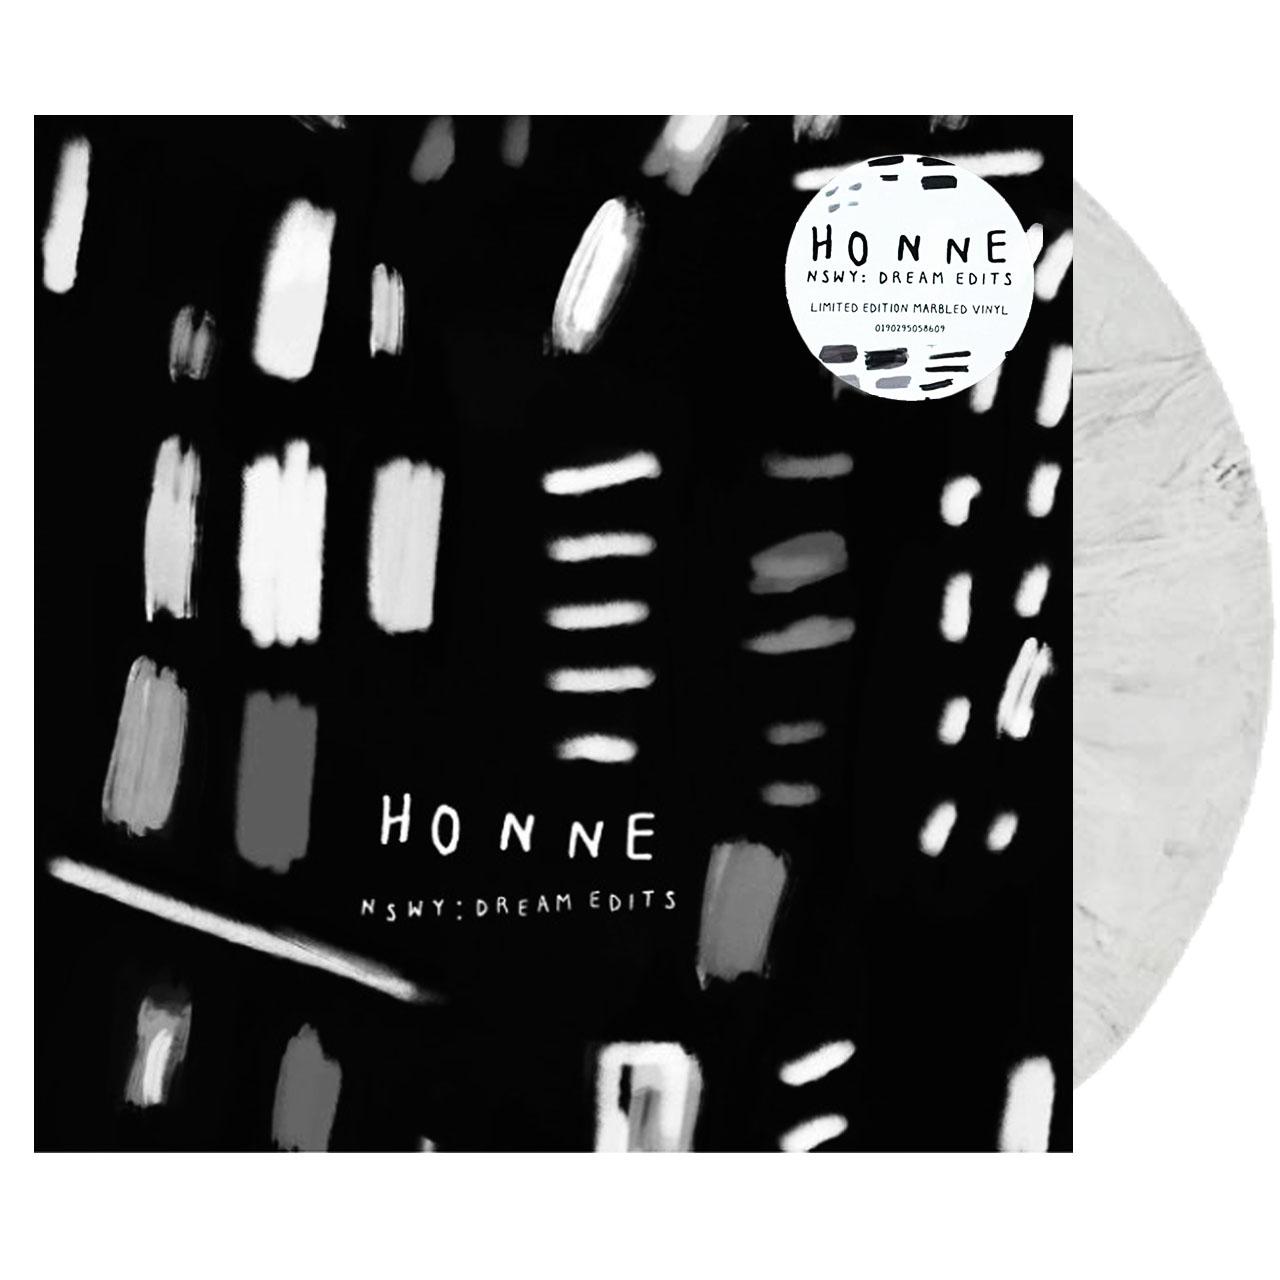 HONNE nswy: dream edits Vinyl (RSD21)